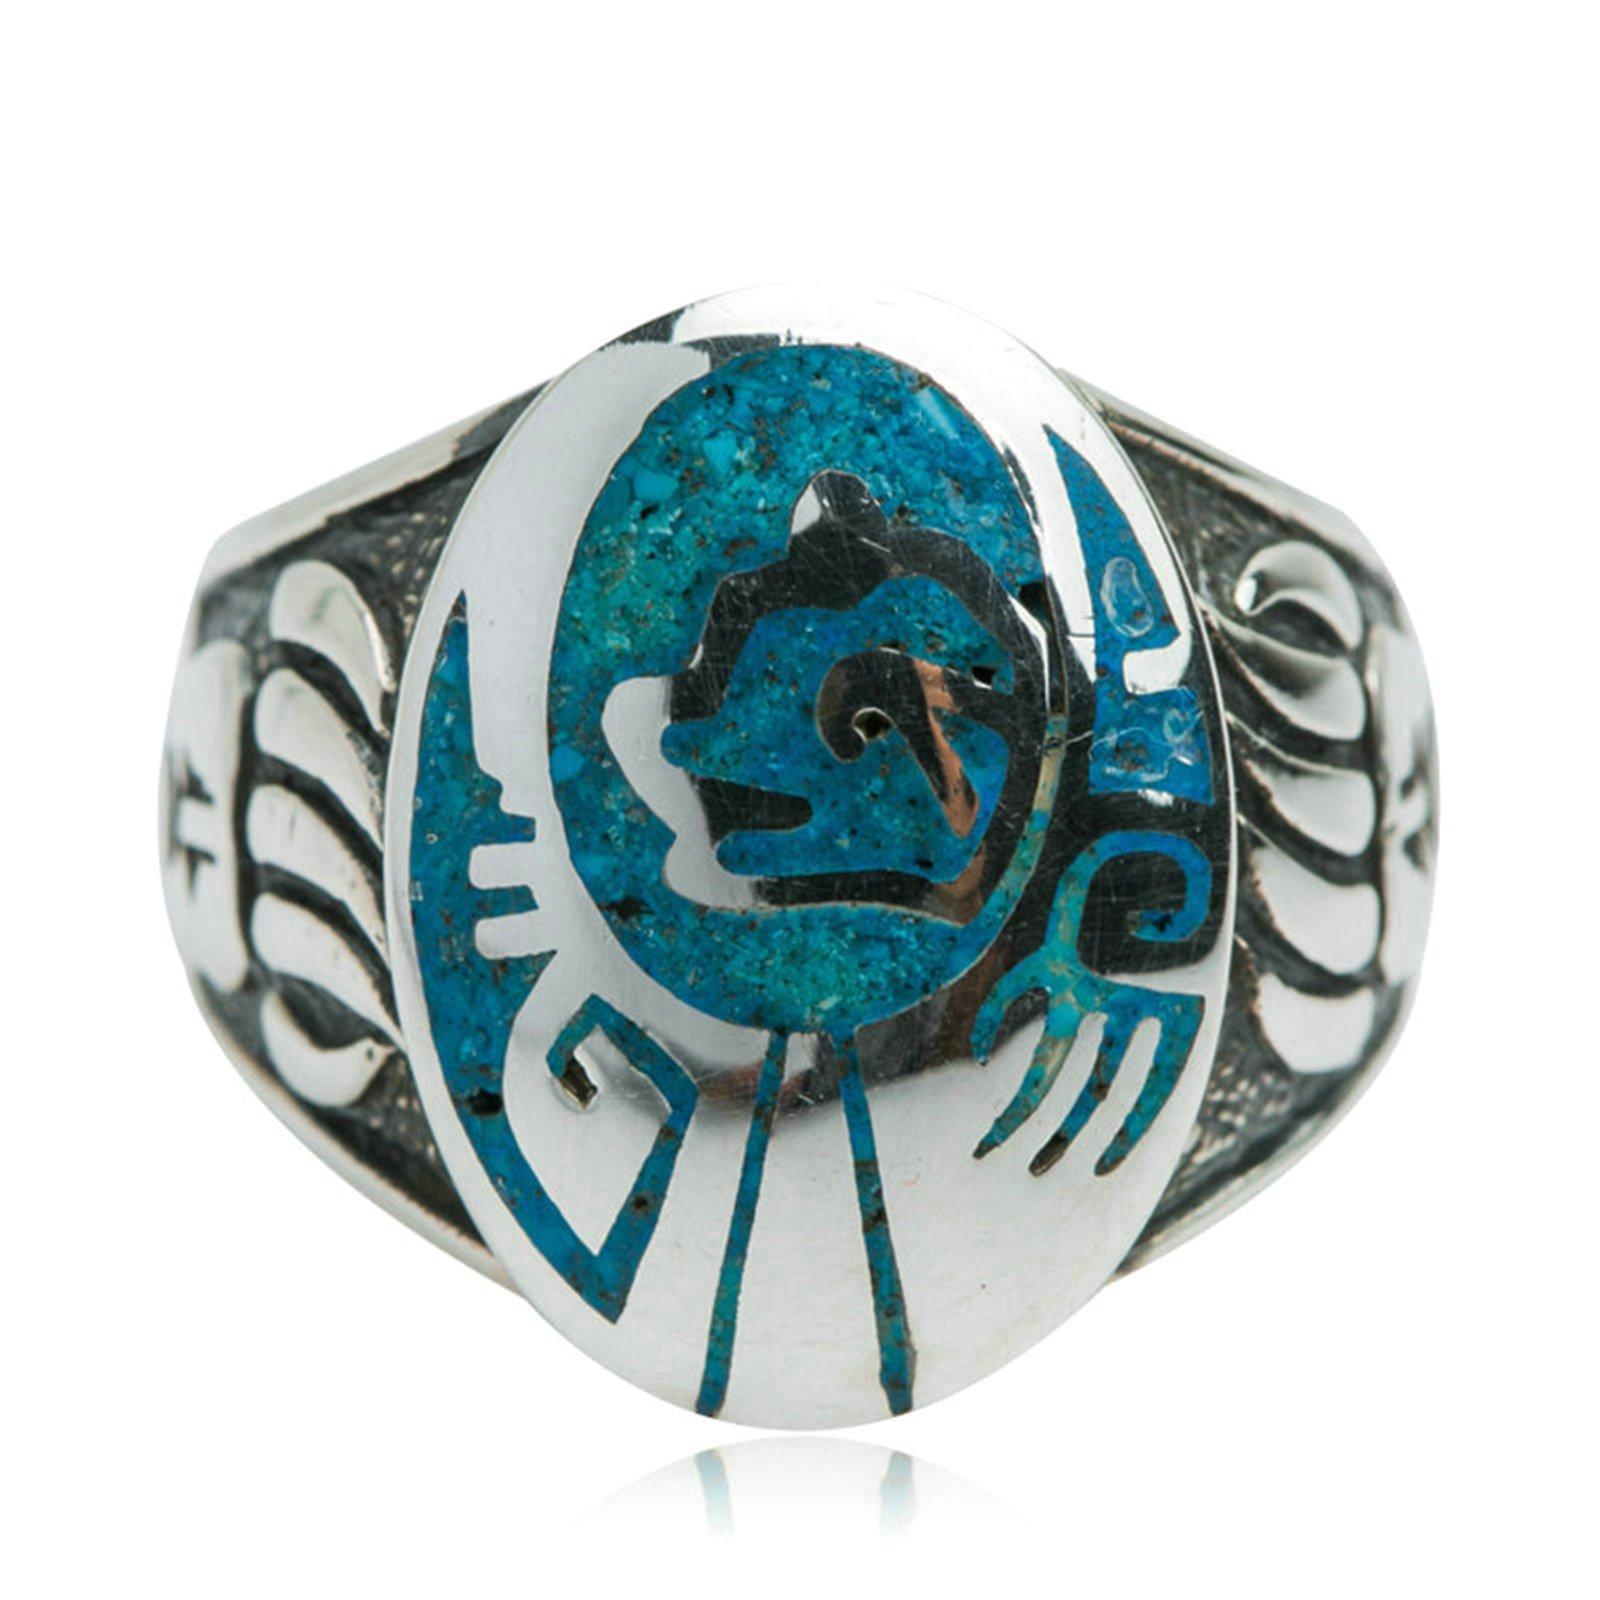 Beydodo Mens Silver Ring, Blue Gemstone Ring Size 11 Punk Biker Ring Bands